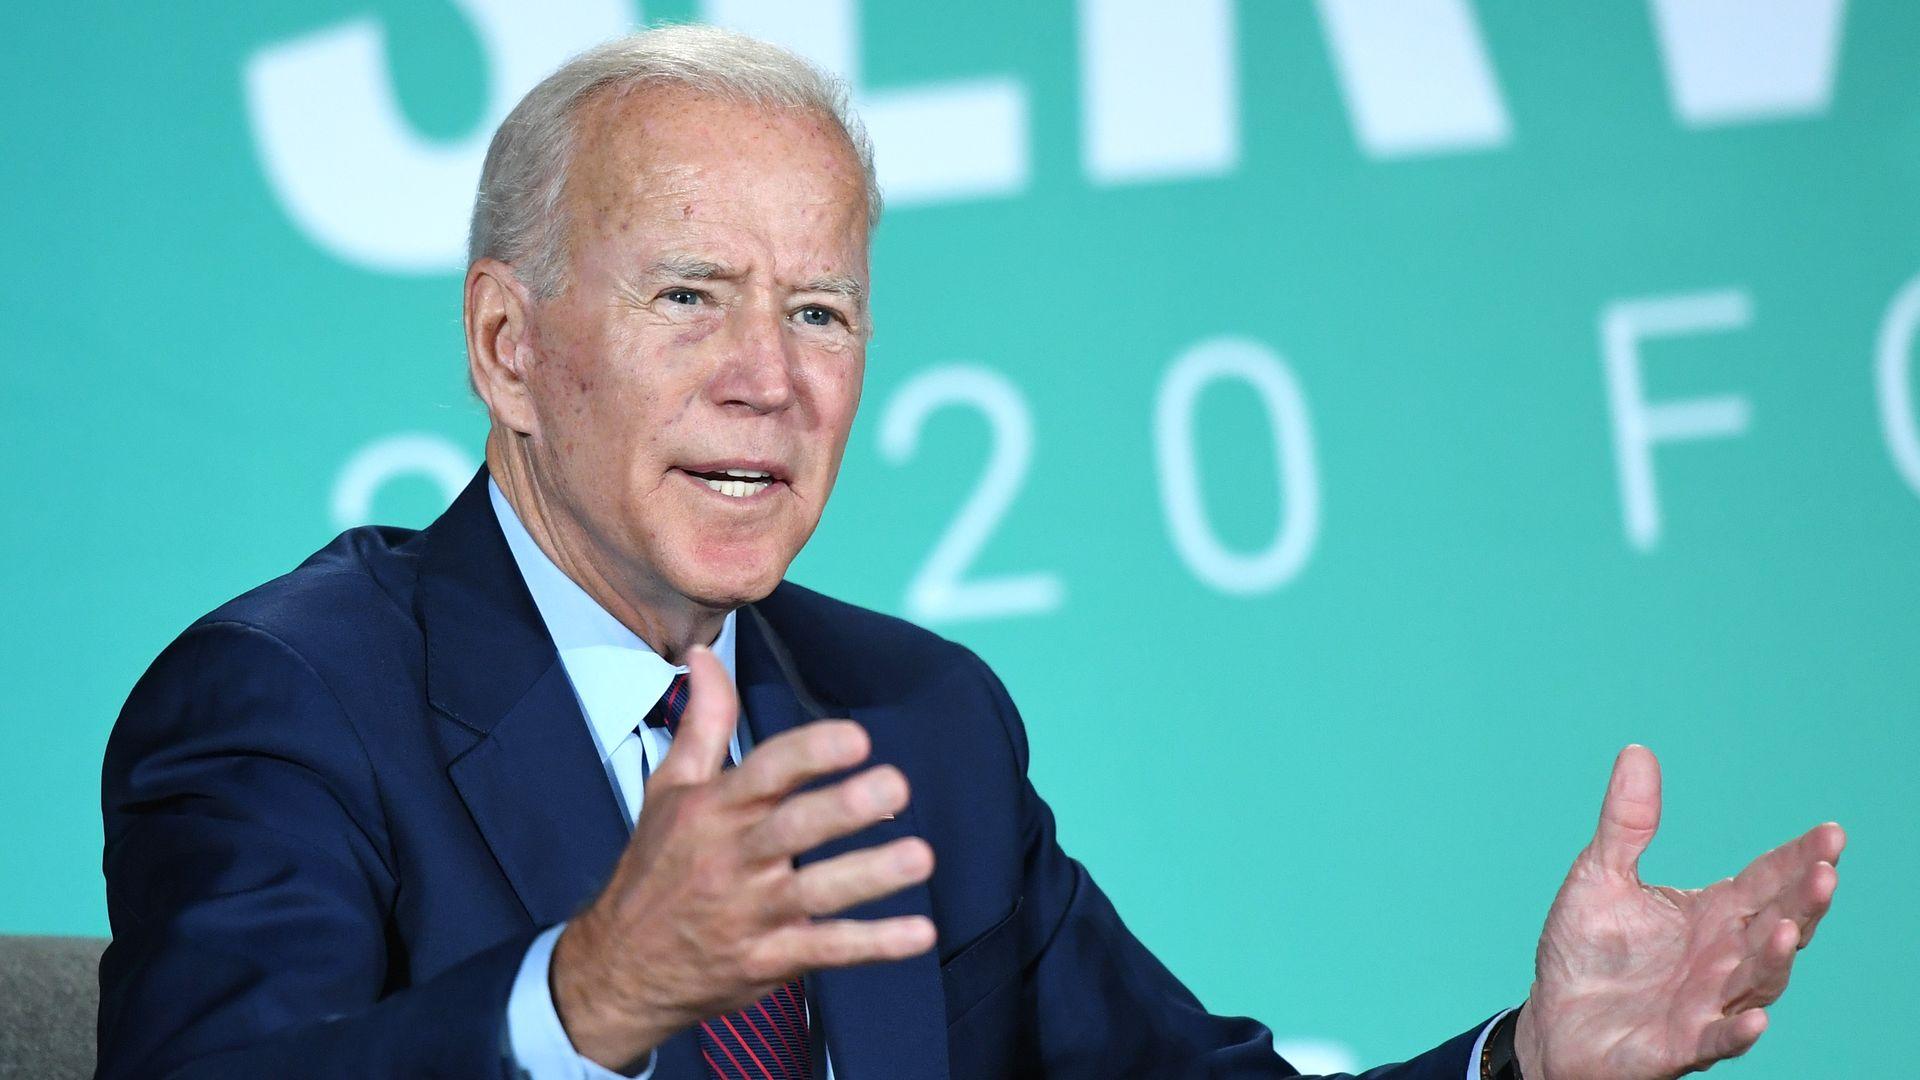 Former U.S. Vice President Joe Biden speaks during the 2020 Public Service Forum